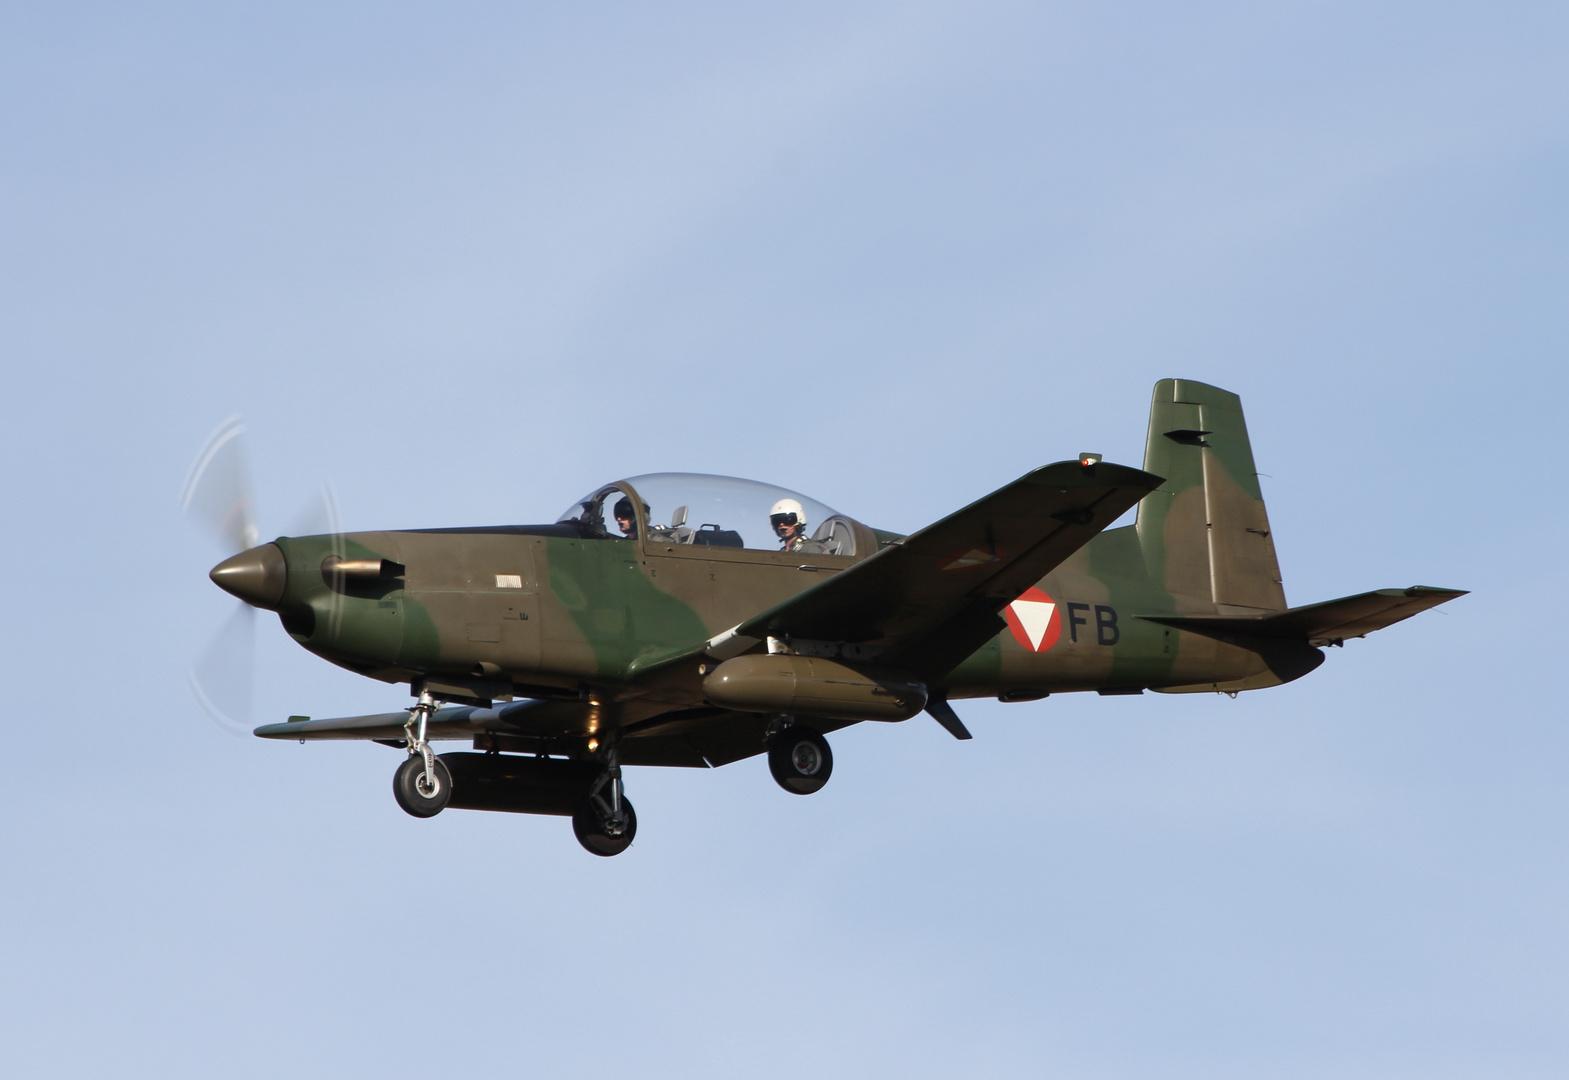 ÖBH - Pilatus PC-7 Turbo Trainer